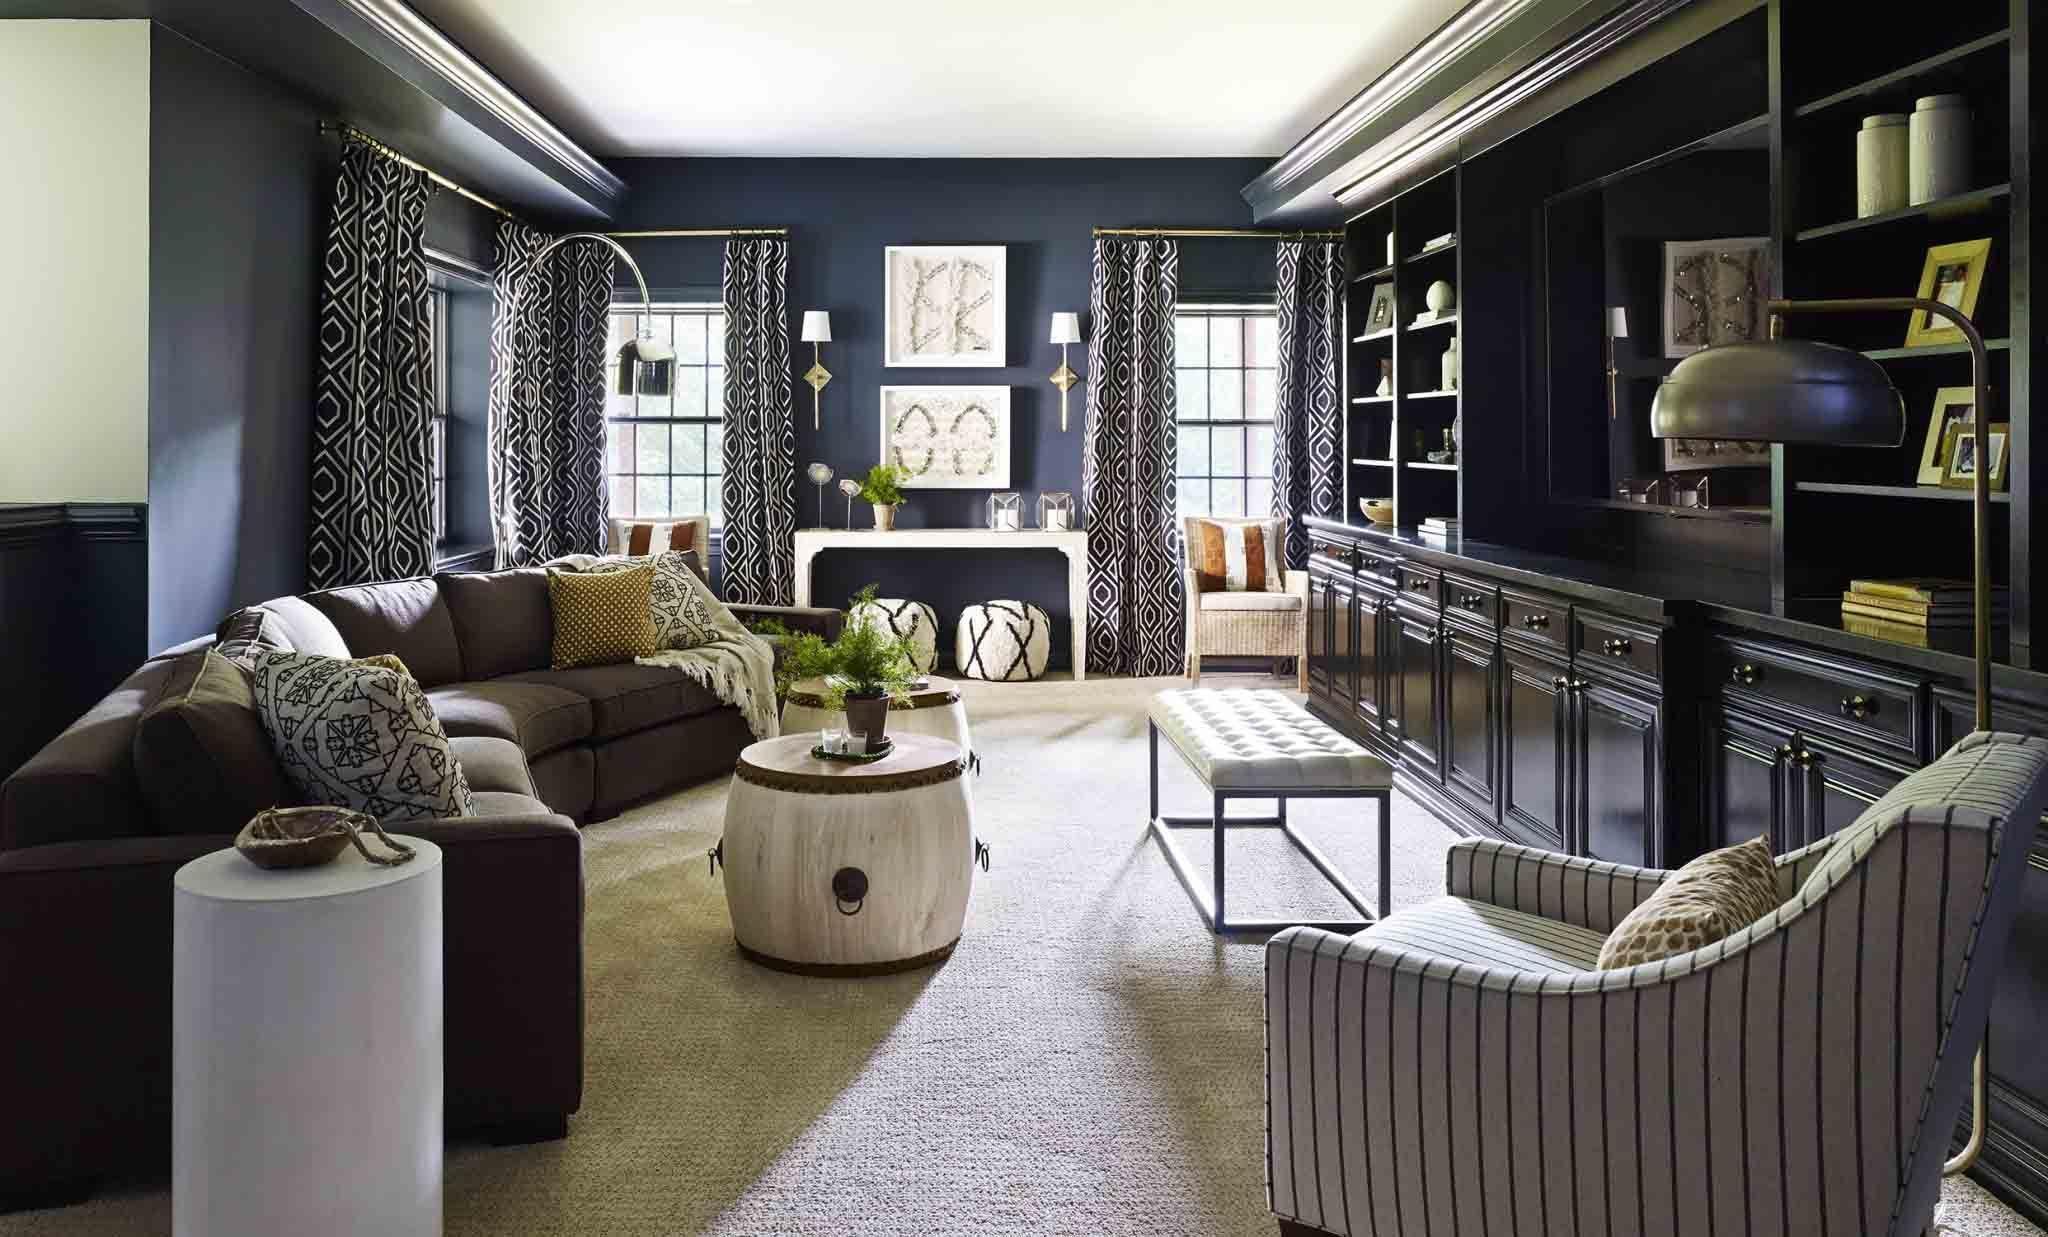 Oprah Nate Berkus transform Iyanla Vanzant s Upper Marlboro home